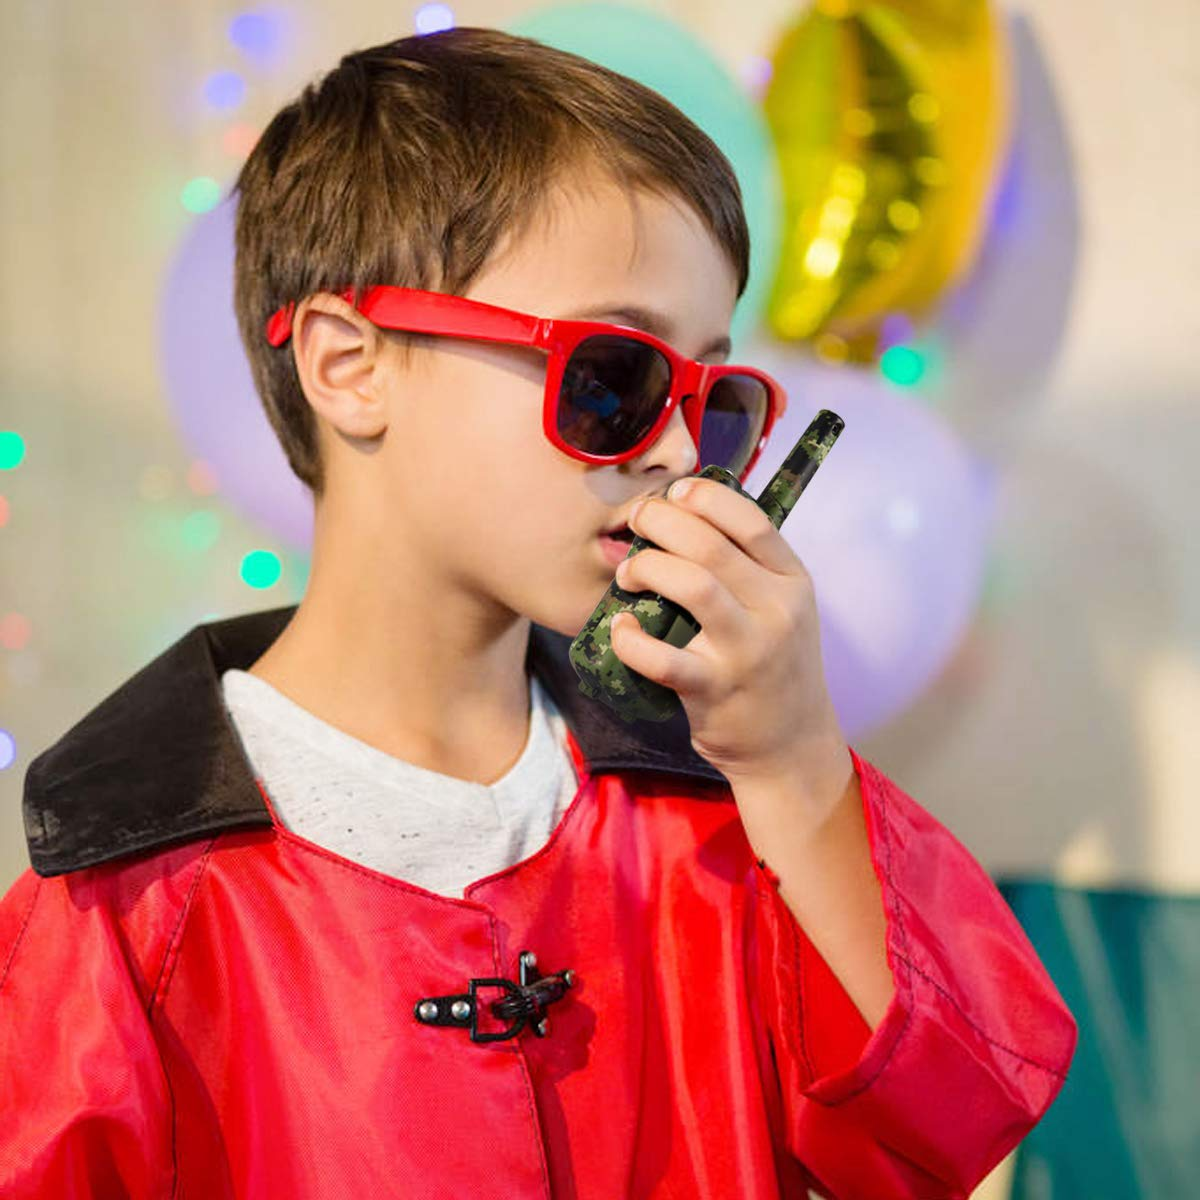 Kids Walkie Talkies, UOKOO Walkie Talkies for Kids 22 Channel FRS/GMRS Two Way Radio Up to 3KM UHF Handheld Walkie Talkies, Toys for 5-year old Boys, Gifts for 7-year Old Boys and Girls by UOKOO (Image #5)